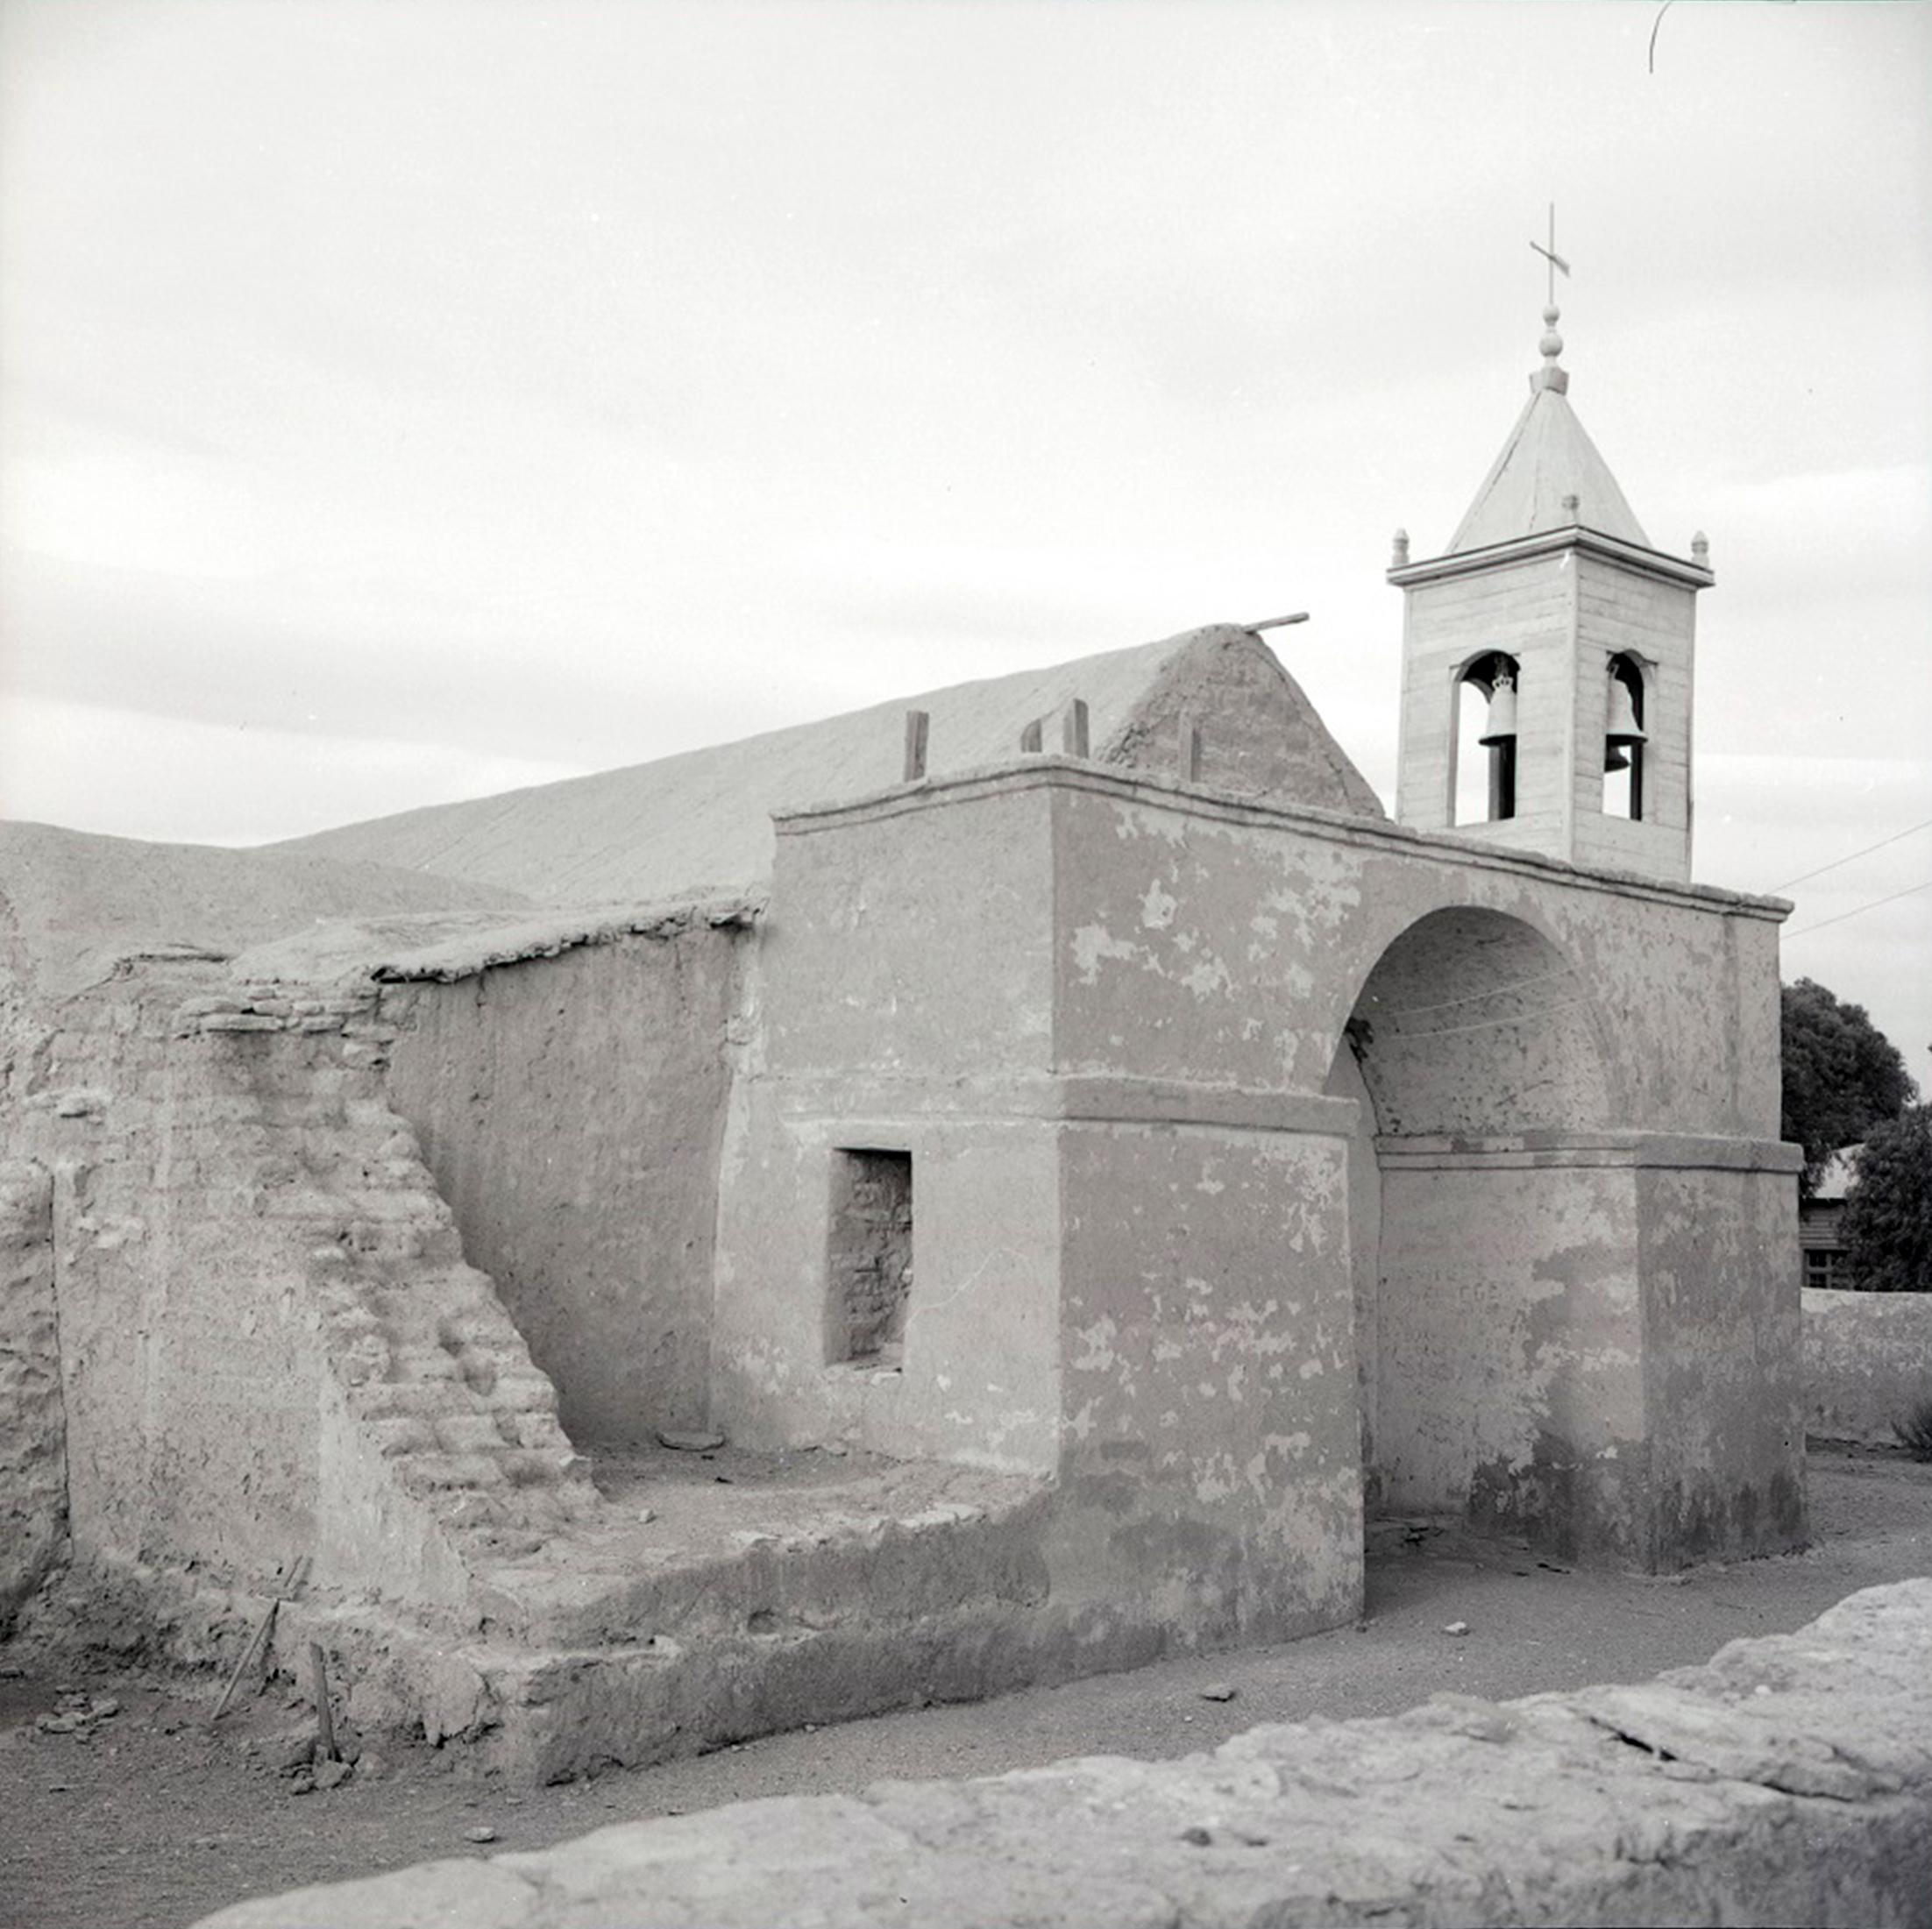 Enterreno - Fotos históricas de chile - fotos antiguas de Chile - Iglesia de San Francisco de Chiu Chiu, 1965